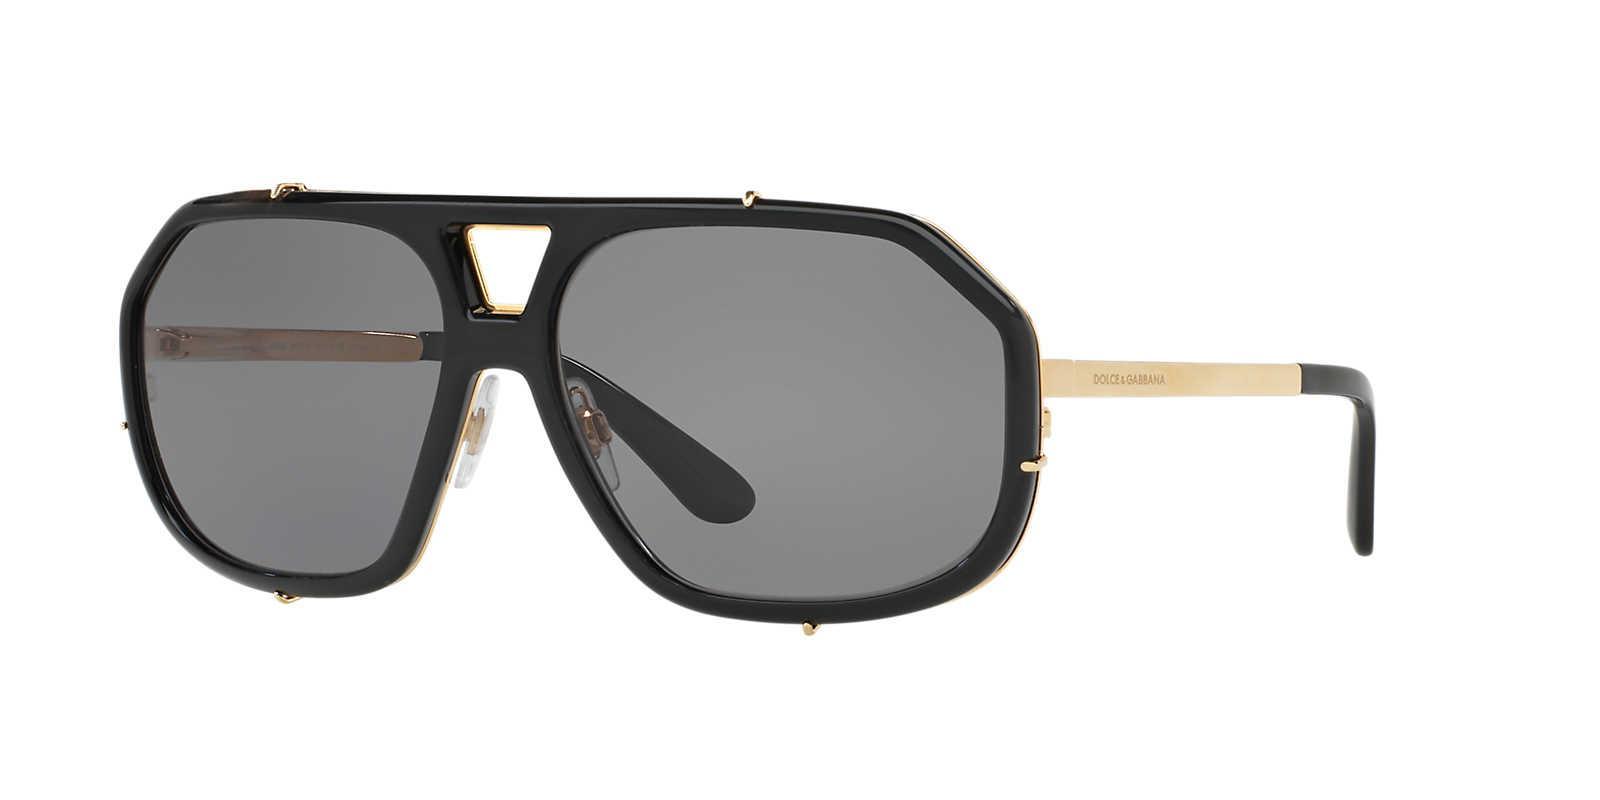 58443c188dc6 Dolce   Gabbana Dg2167 in Gray for Men - Save 41% - Lyst